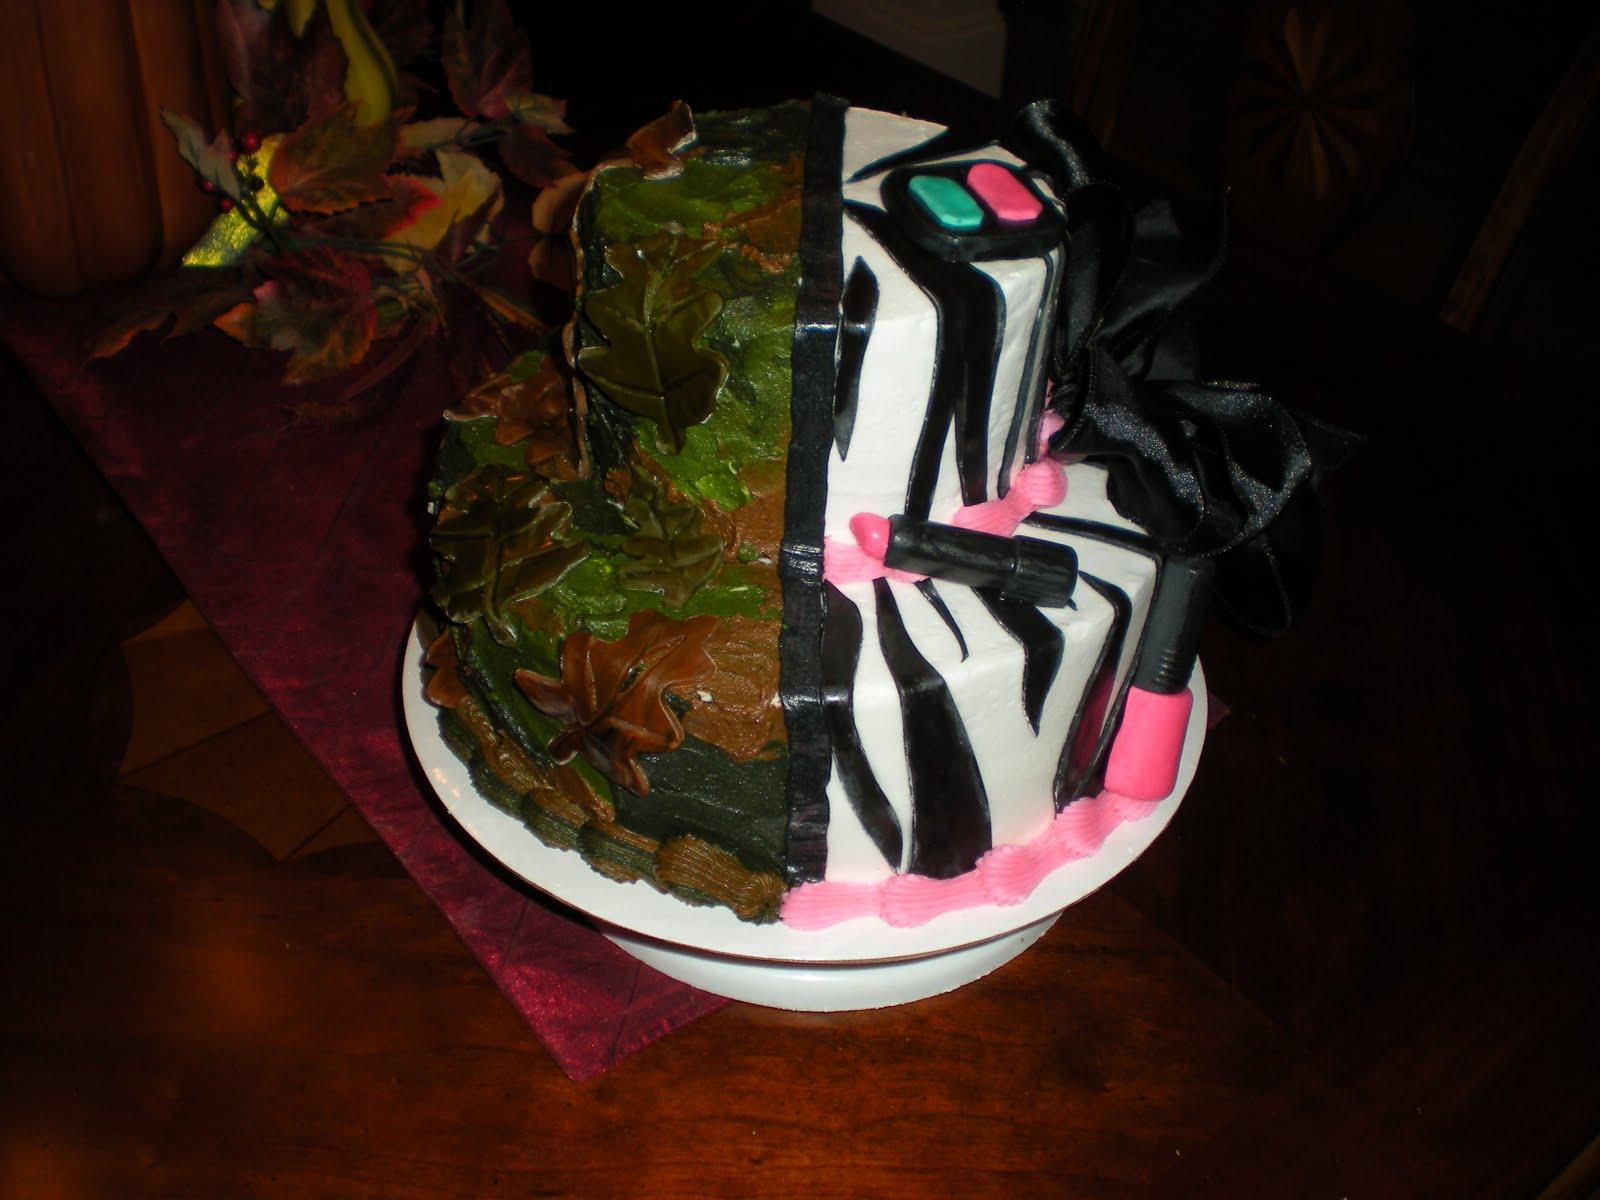 Tremendous 9 Sweet 16 Birthday Cakes For Twin Girls Photo Sweet 16 Birthday Funny Birthday Cards Online Barepcheapnameinfo